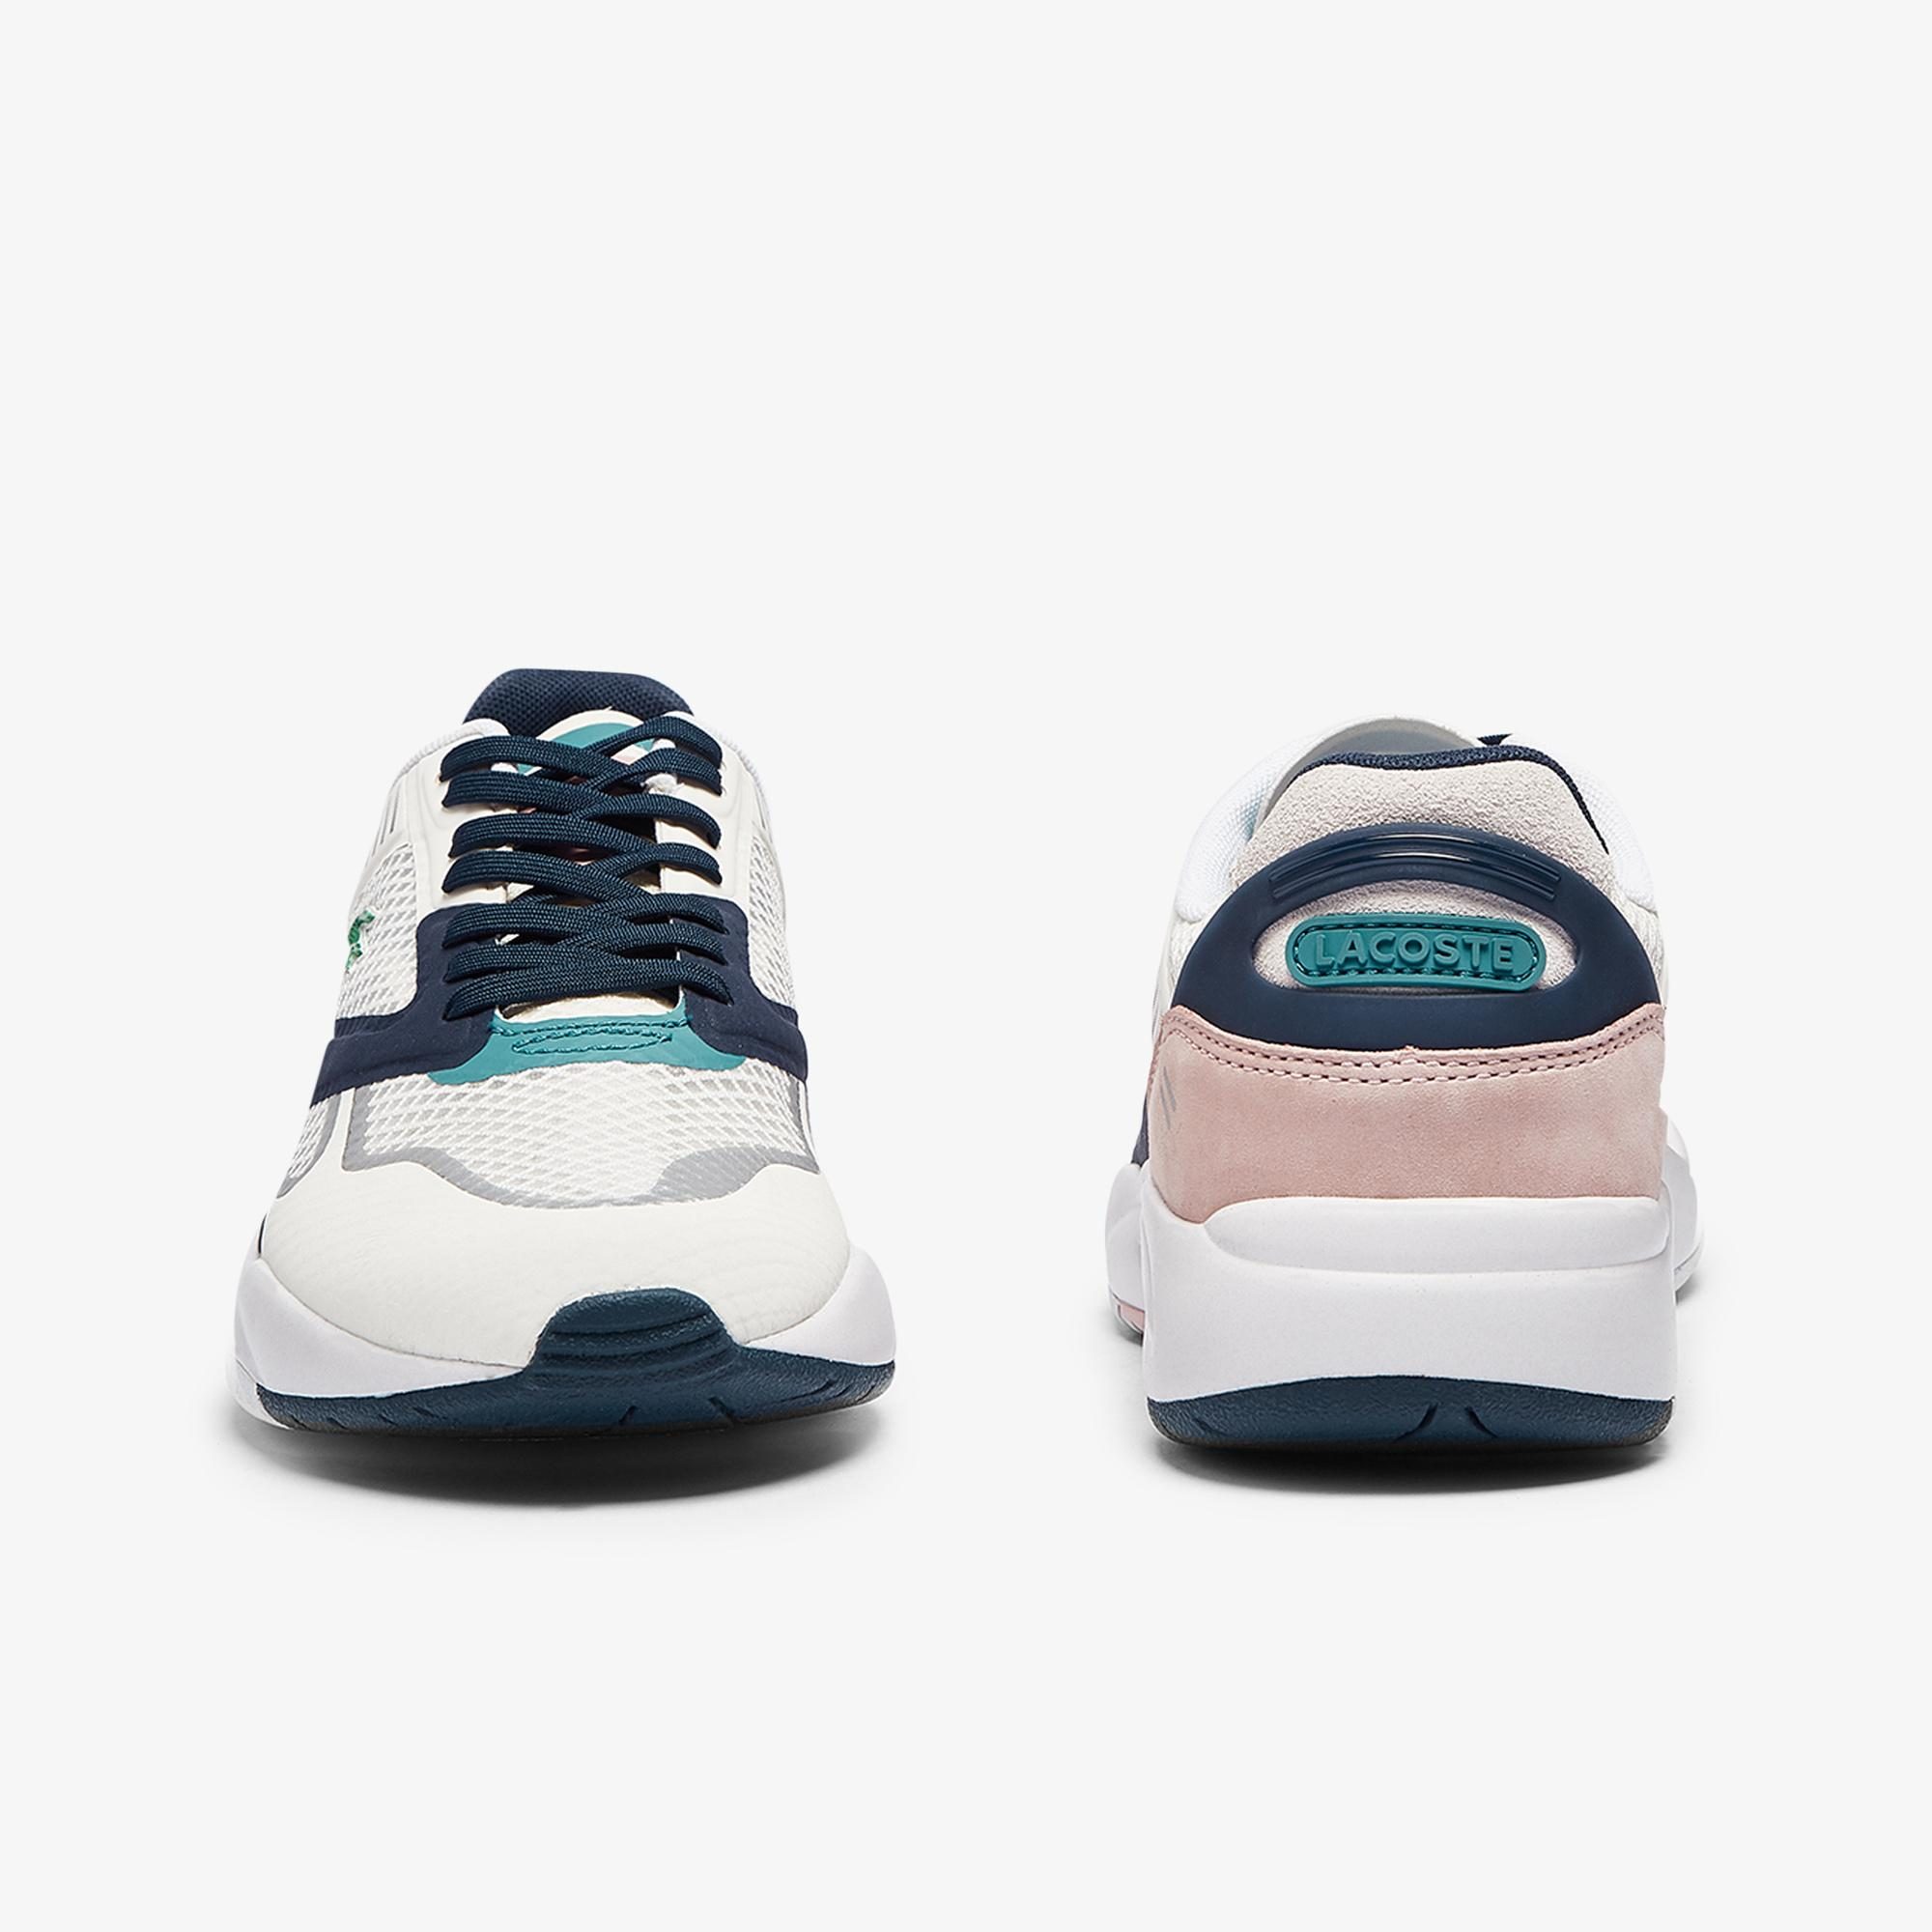 Lacoste кросівки жіночі Storm 96 Nano